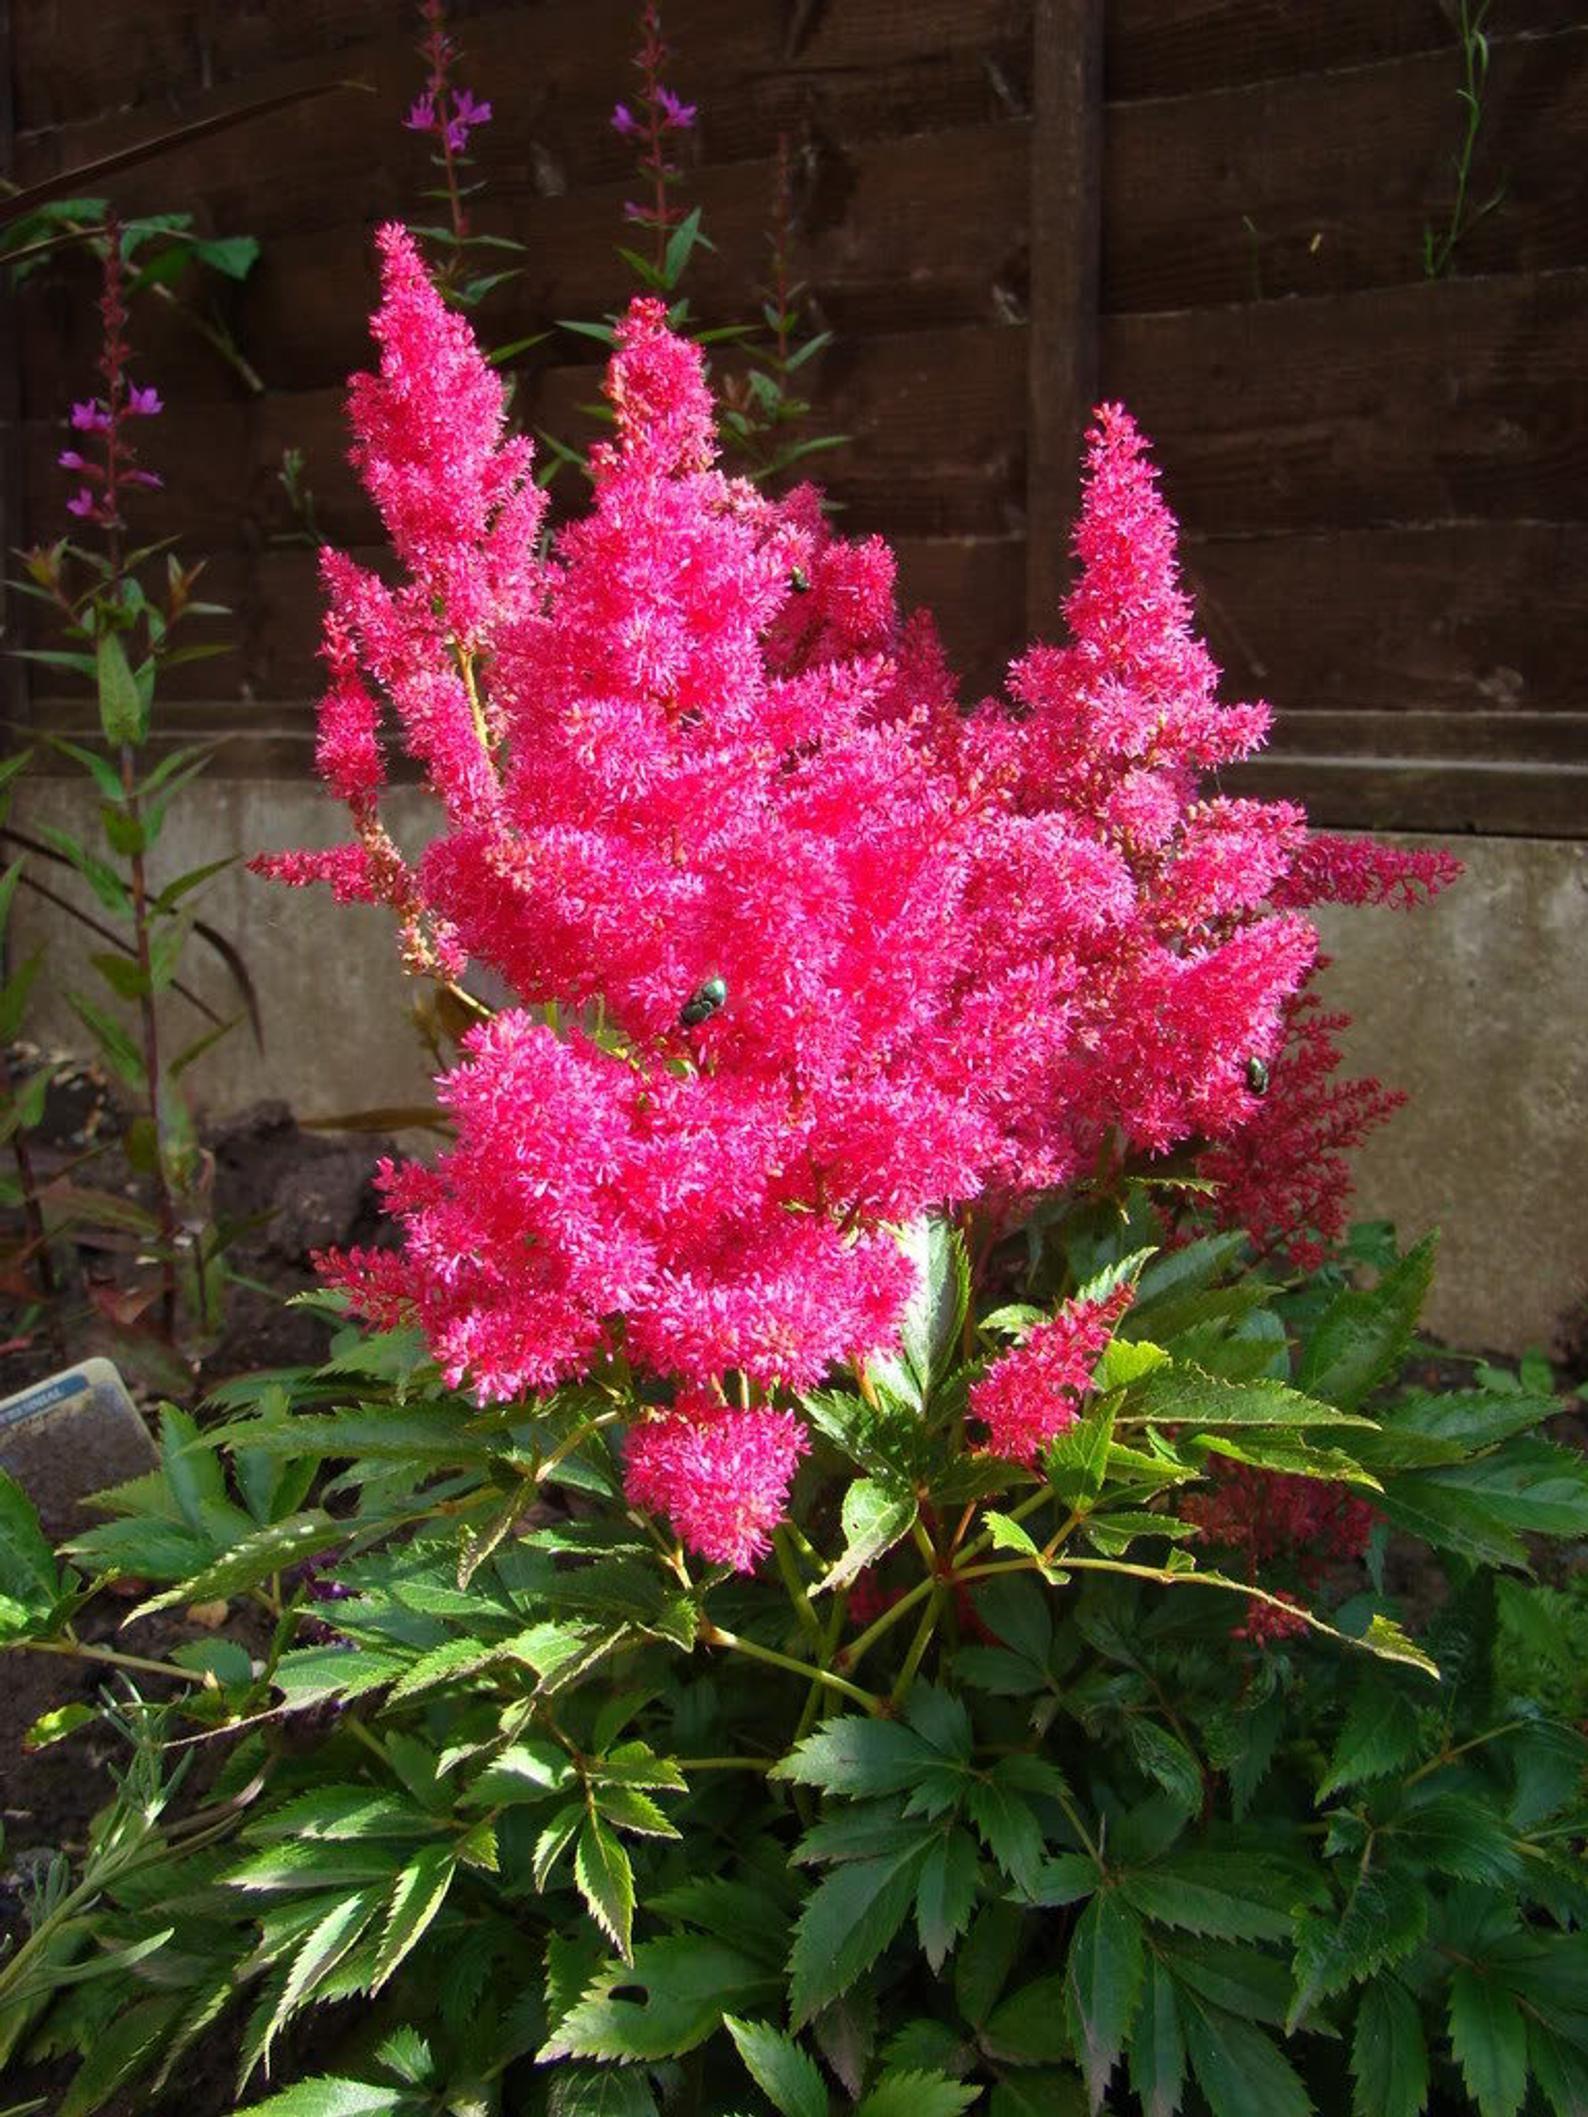 100 Pink Mix Astilbe False Spirea False Goats Beard Etsy In 2020 Flower Seeds Goats Beard Spirea